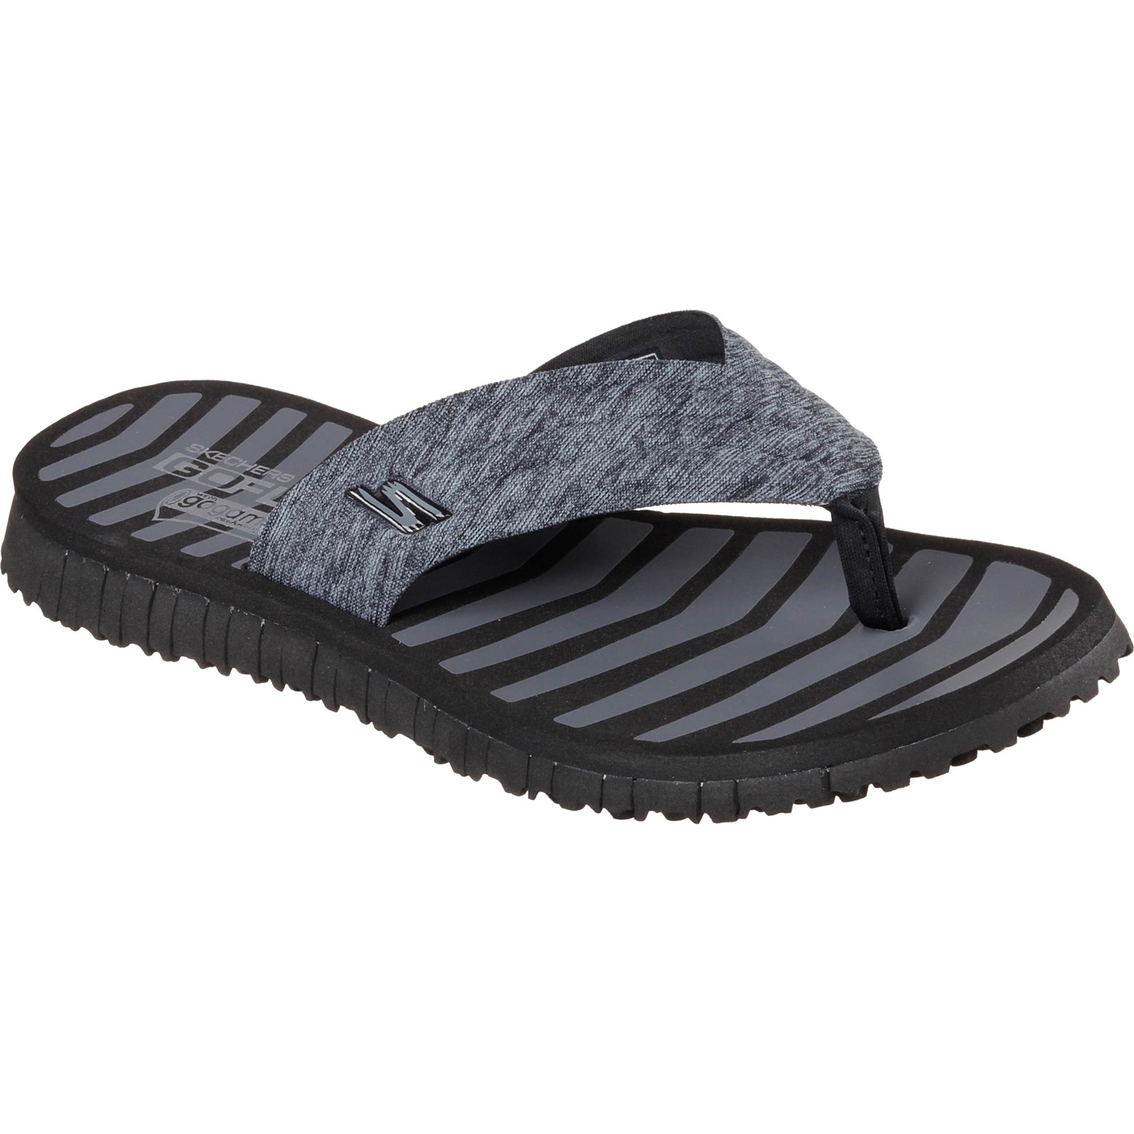 64adf8fae3e7 Skechers Women s Go Flex Vitality Sandals